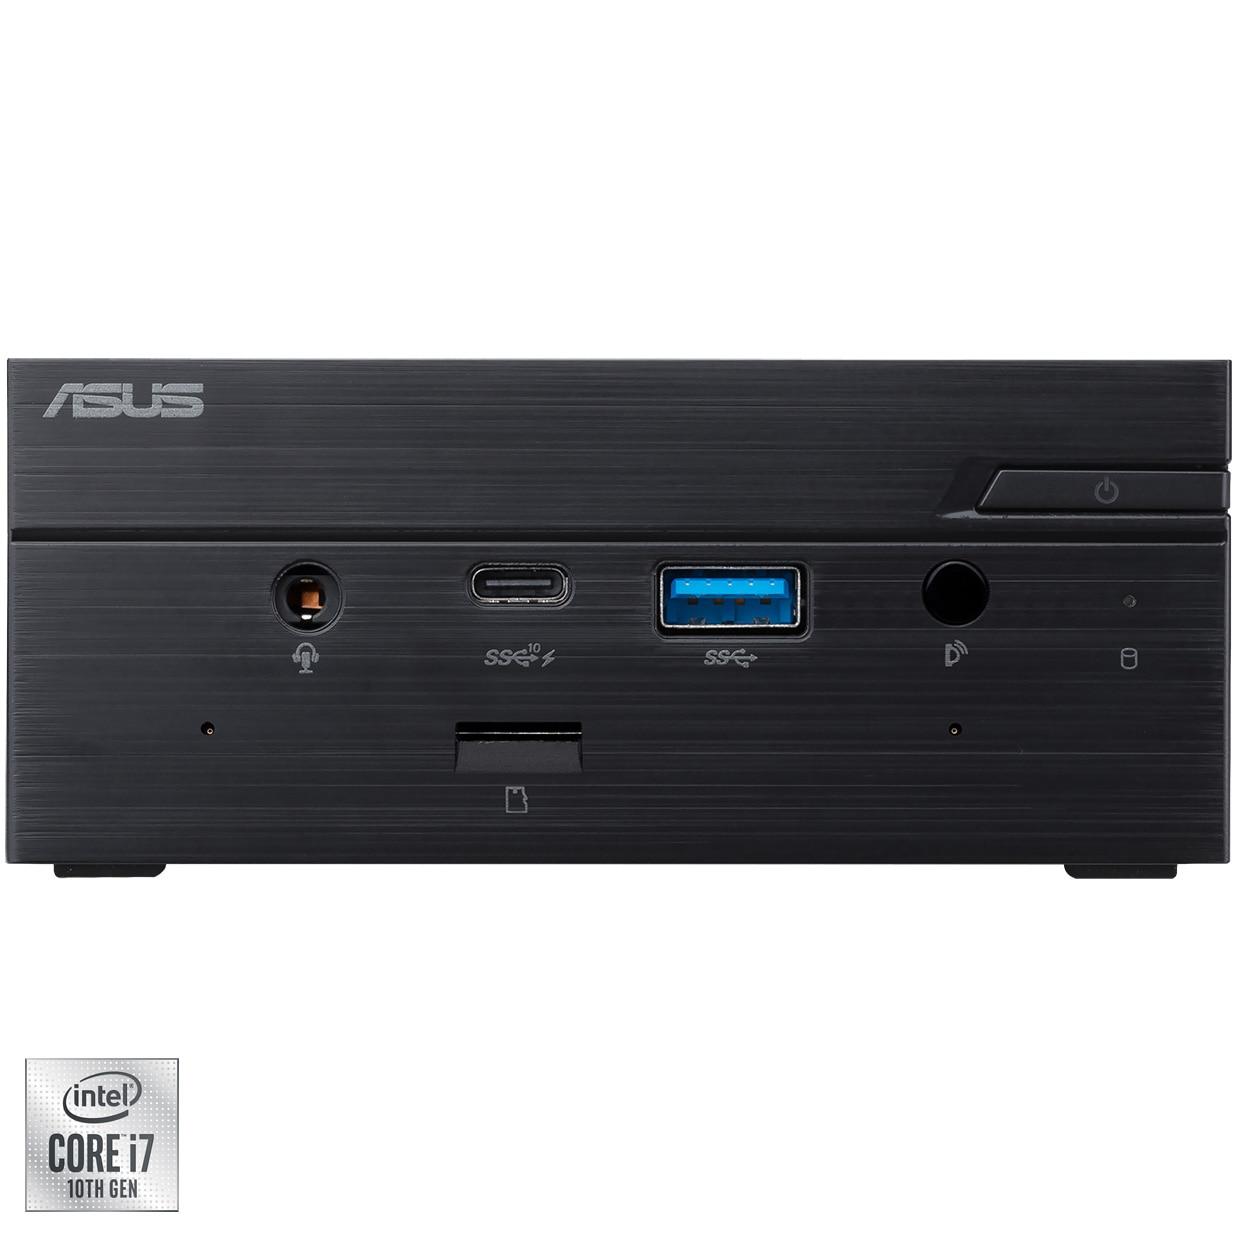 Fotografie Mini PC ASUS PN62-BB7005MD cu procesor Intel® Core™ i7-10510U pana la 4.90GHz, fara RAM, fara stocare, Intel® UHD Graphics, No OS